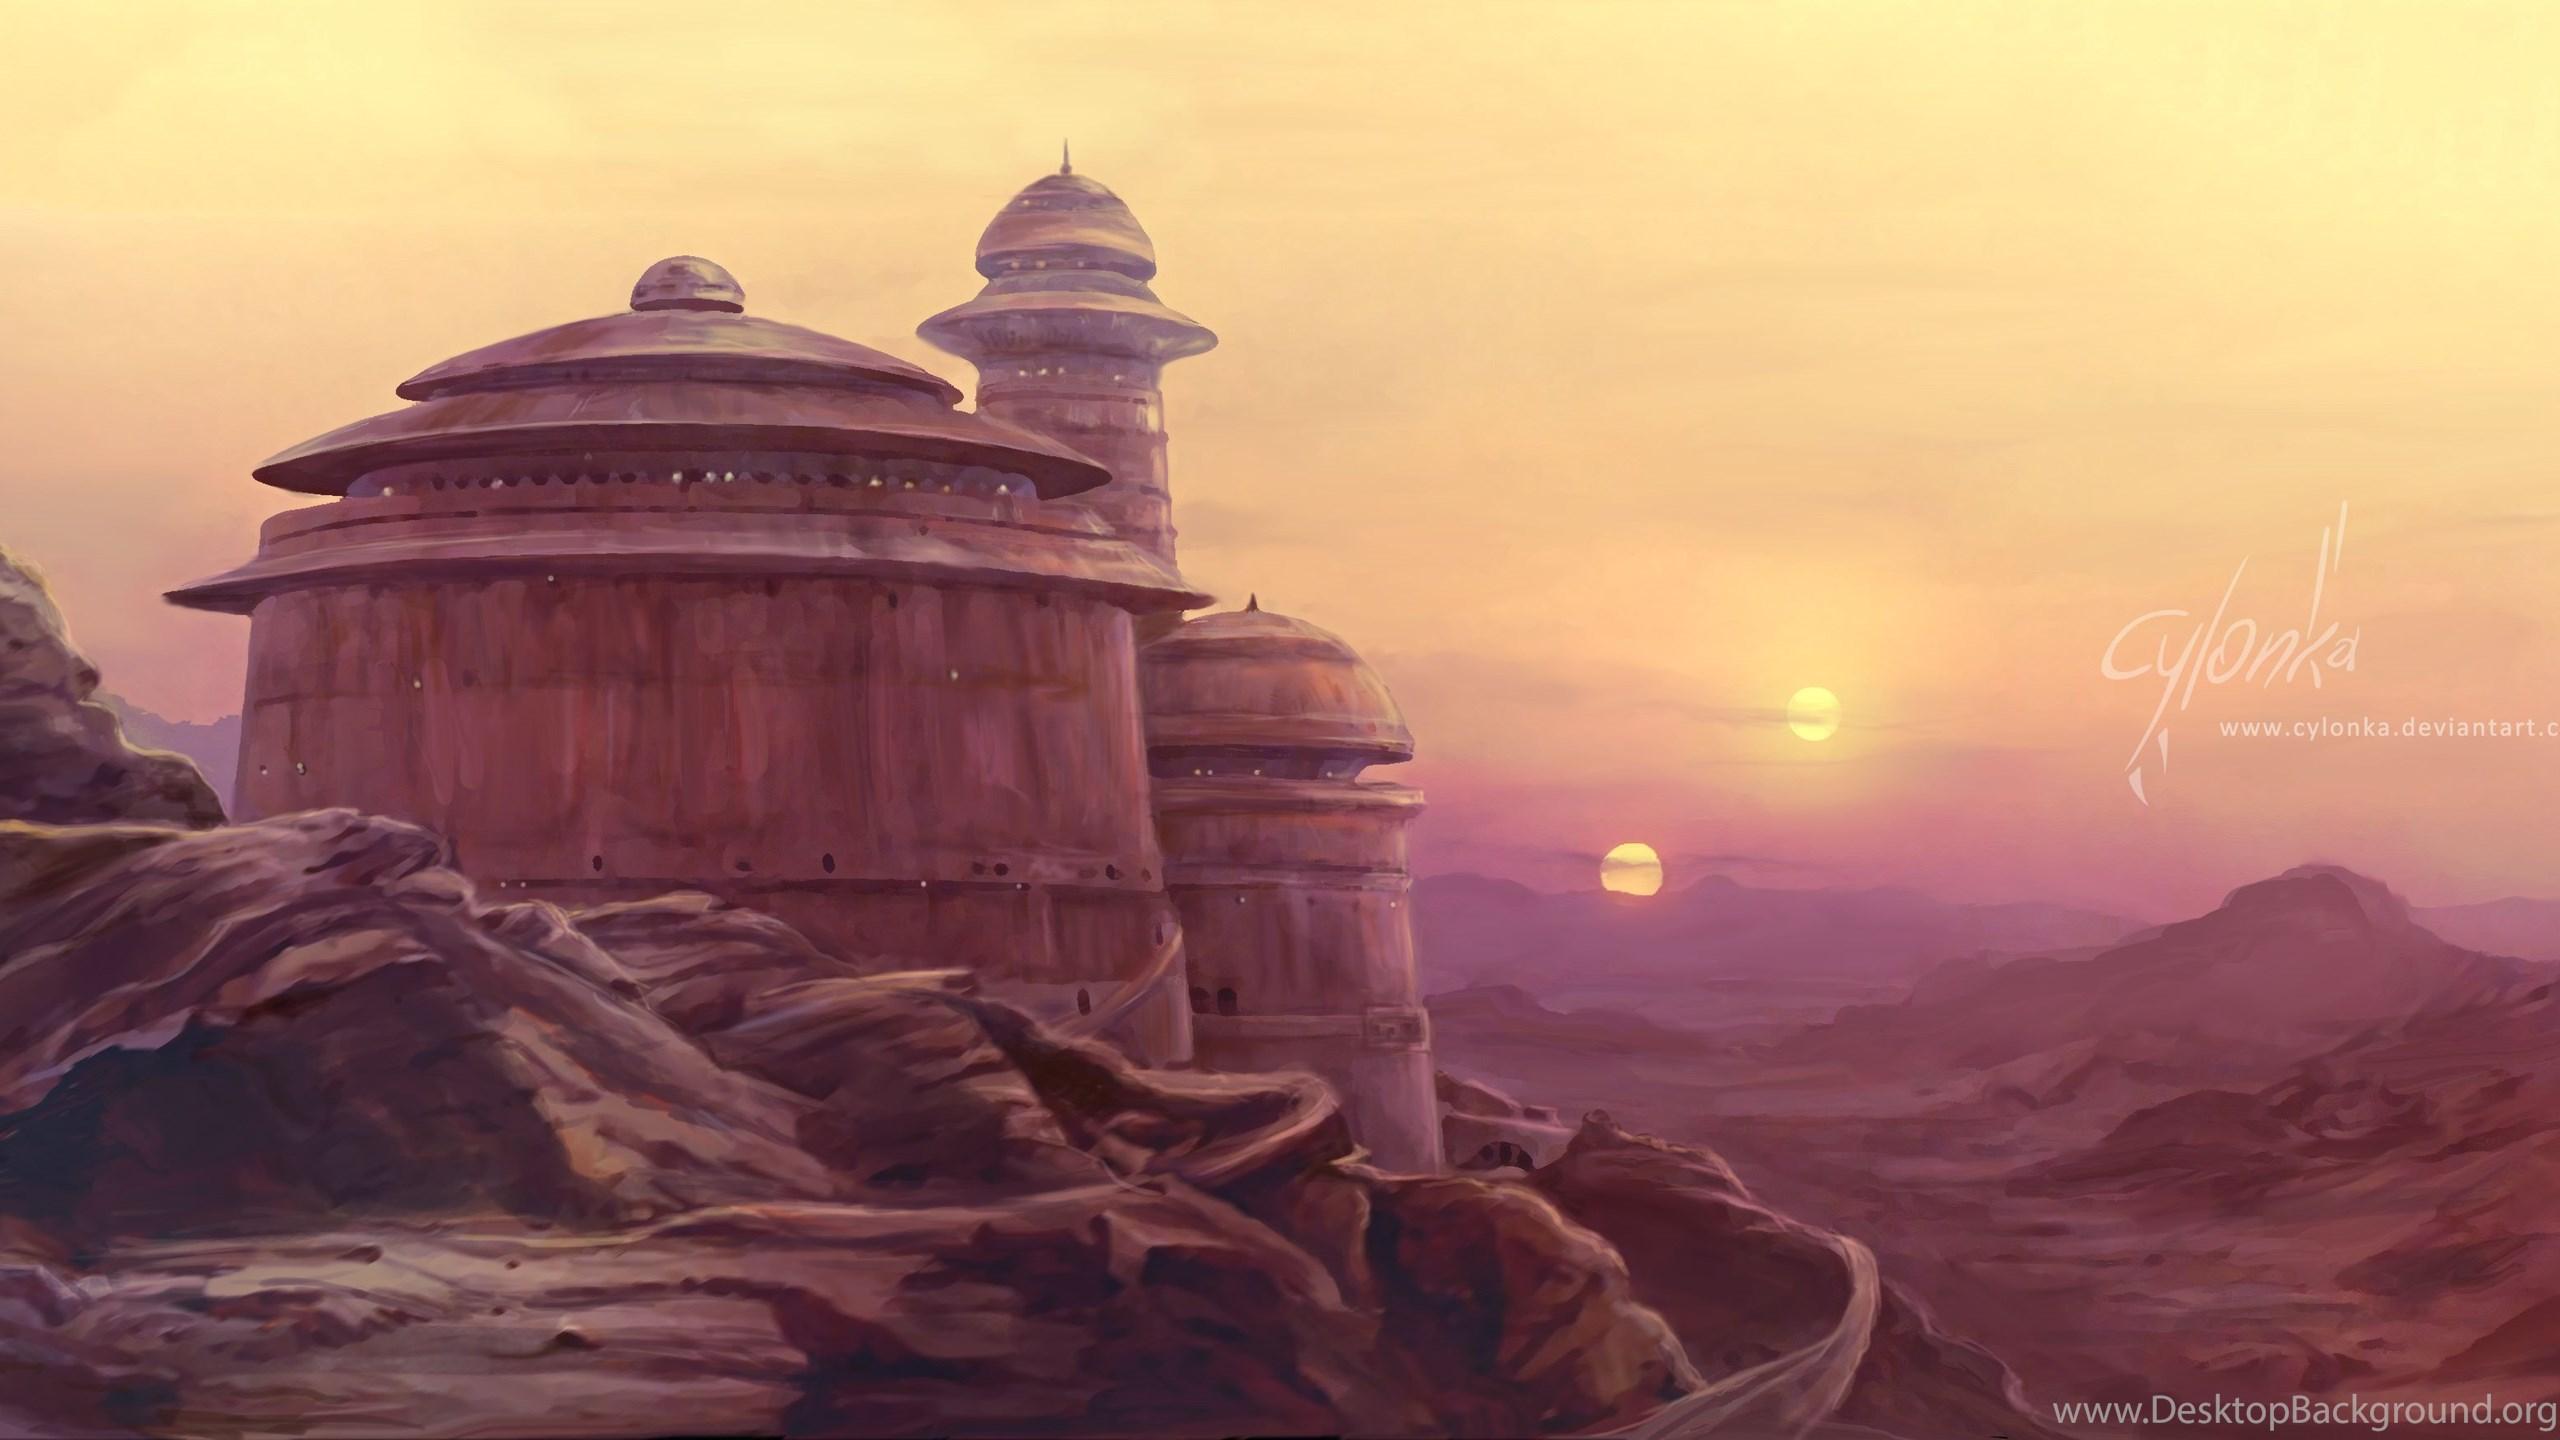 Star Wars Tatooine On Pinterest Desktop Background